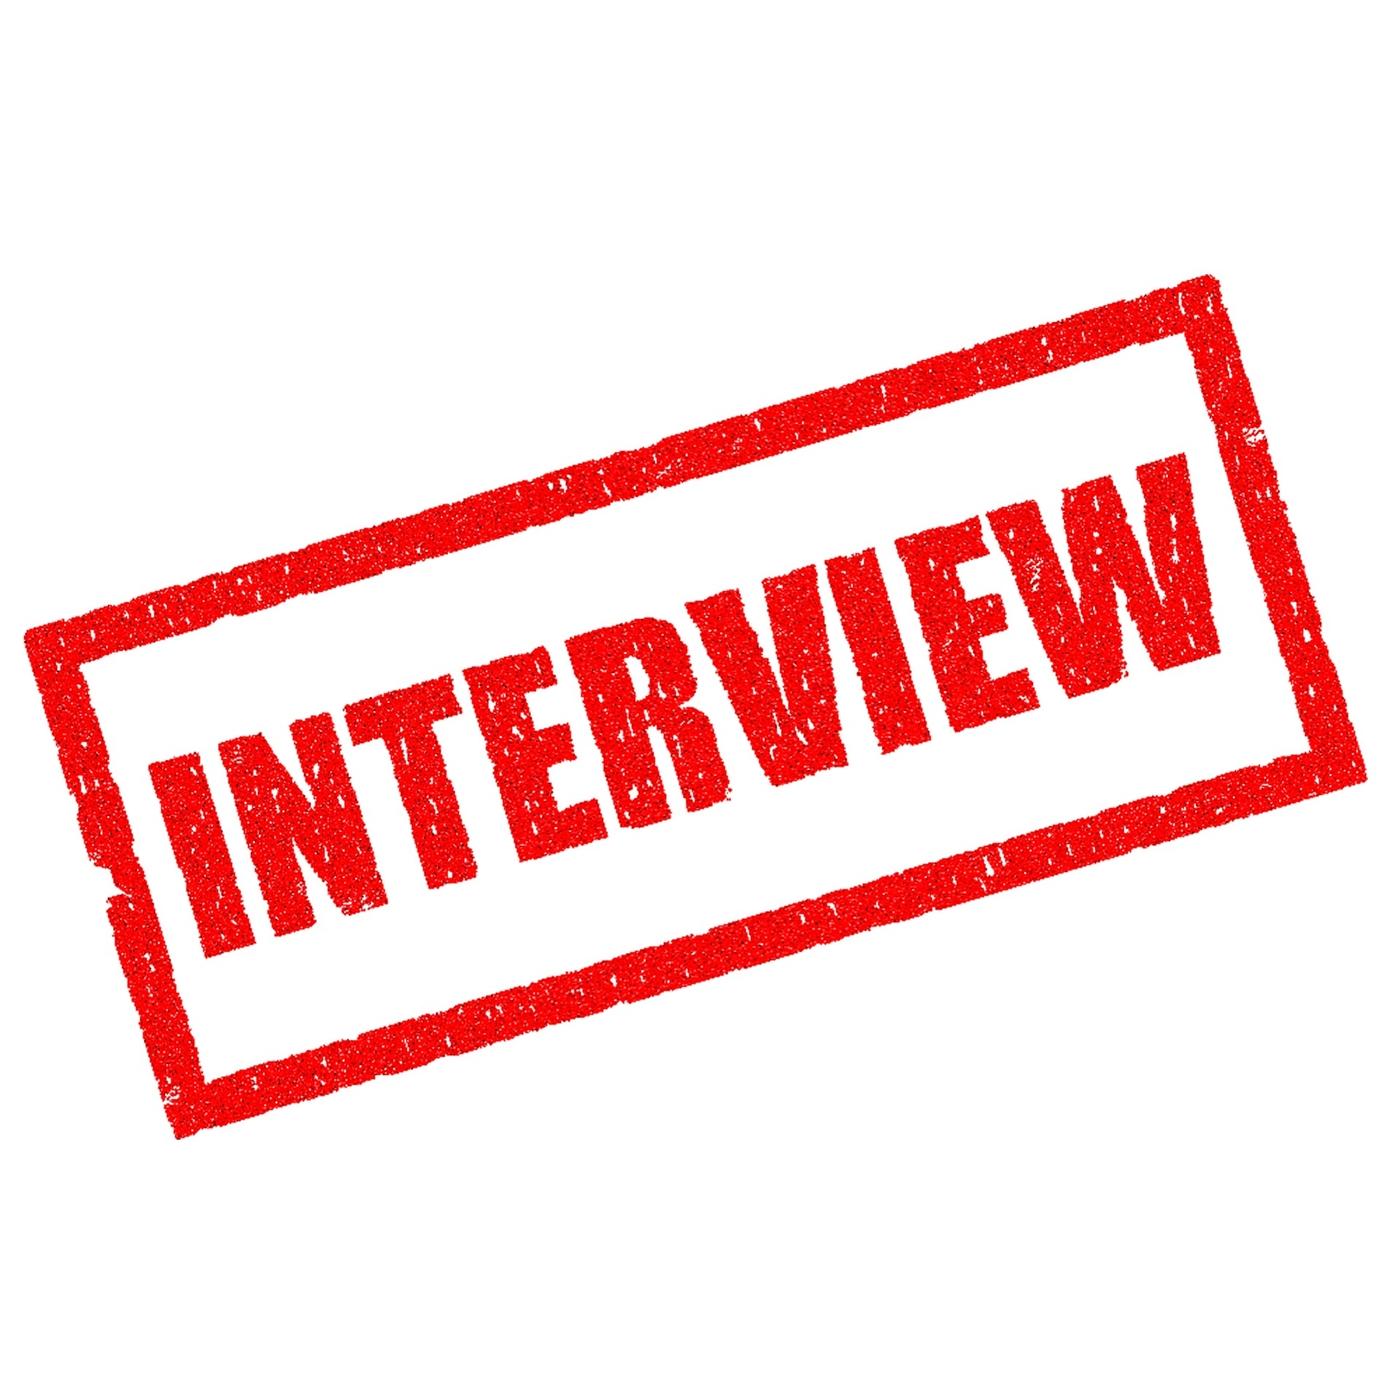 interview-1714370_1920.jpg